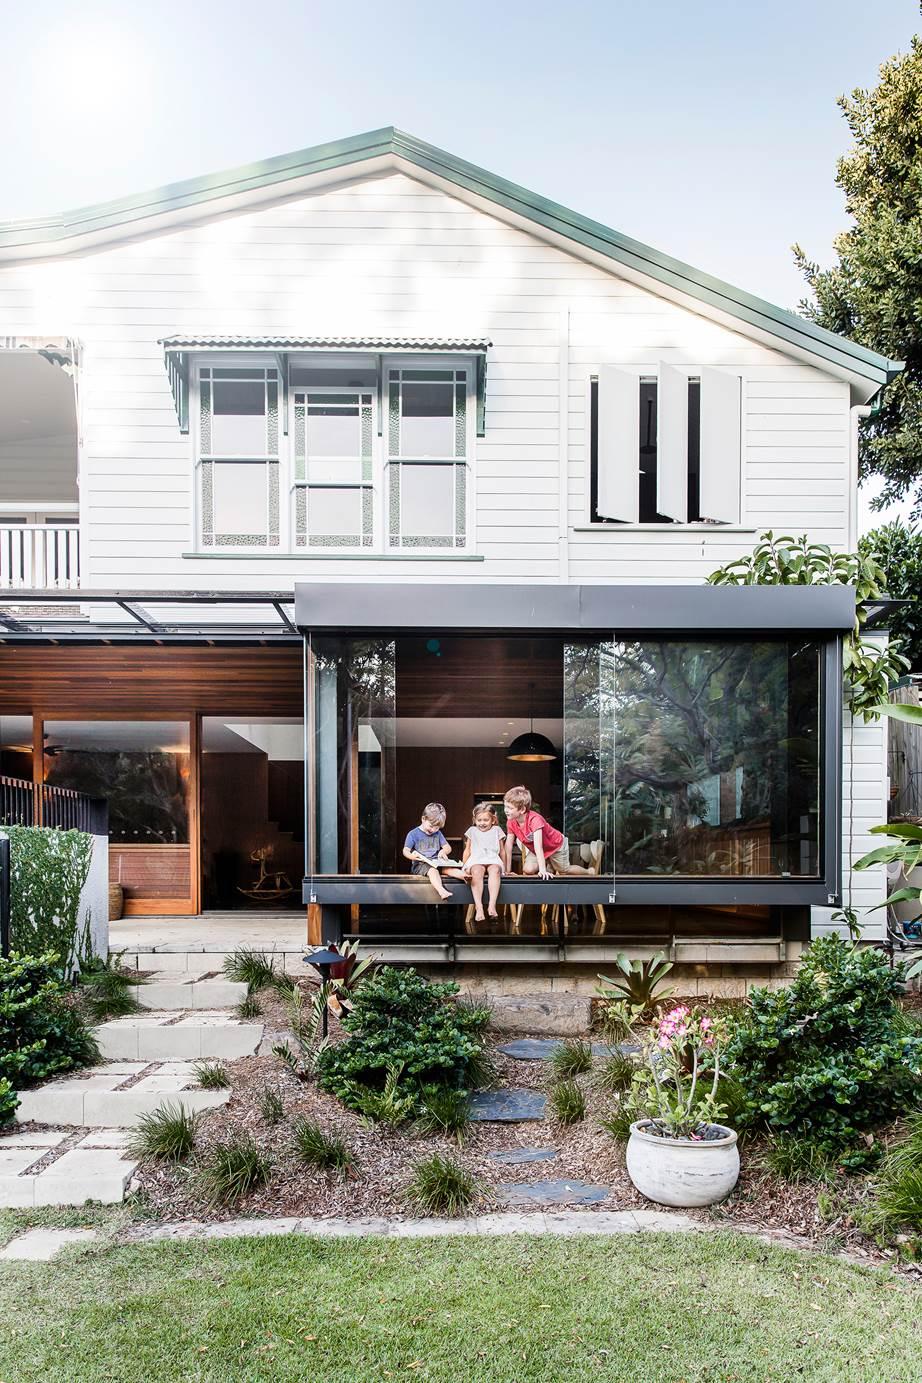 Upside Down House by Kieron Gait